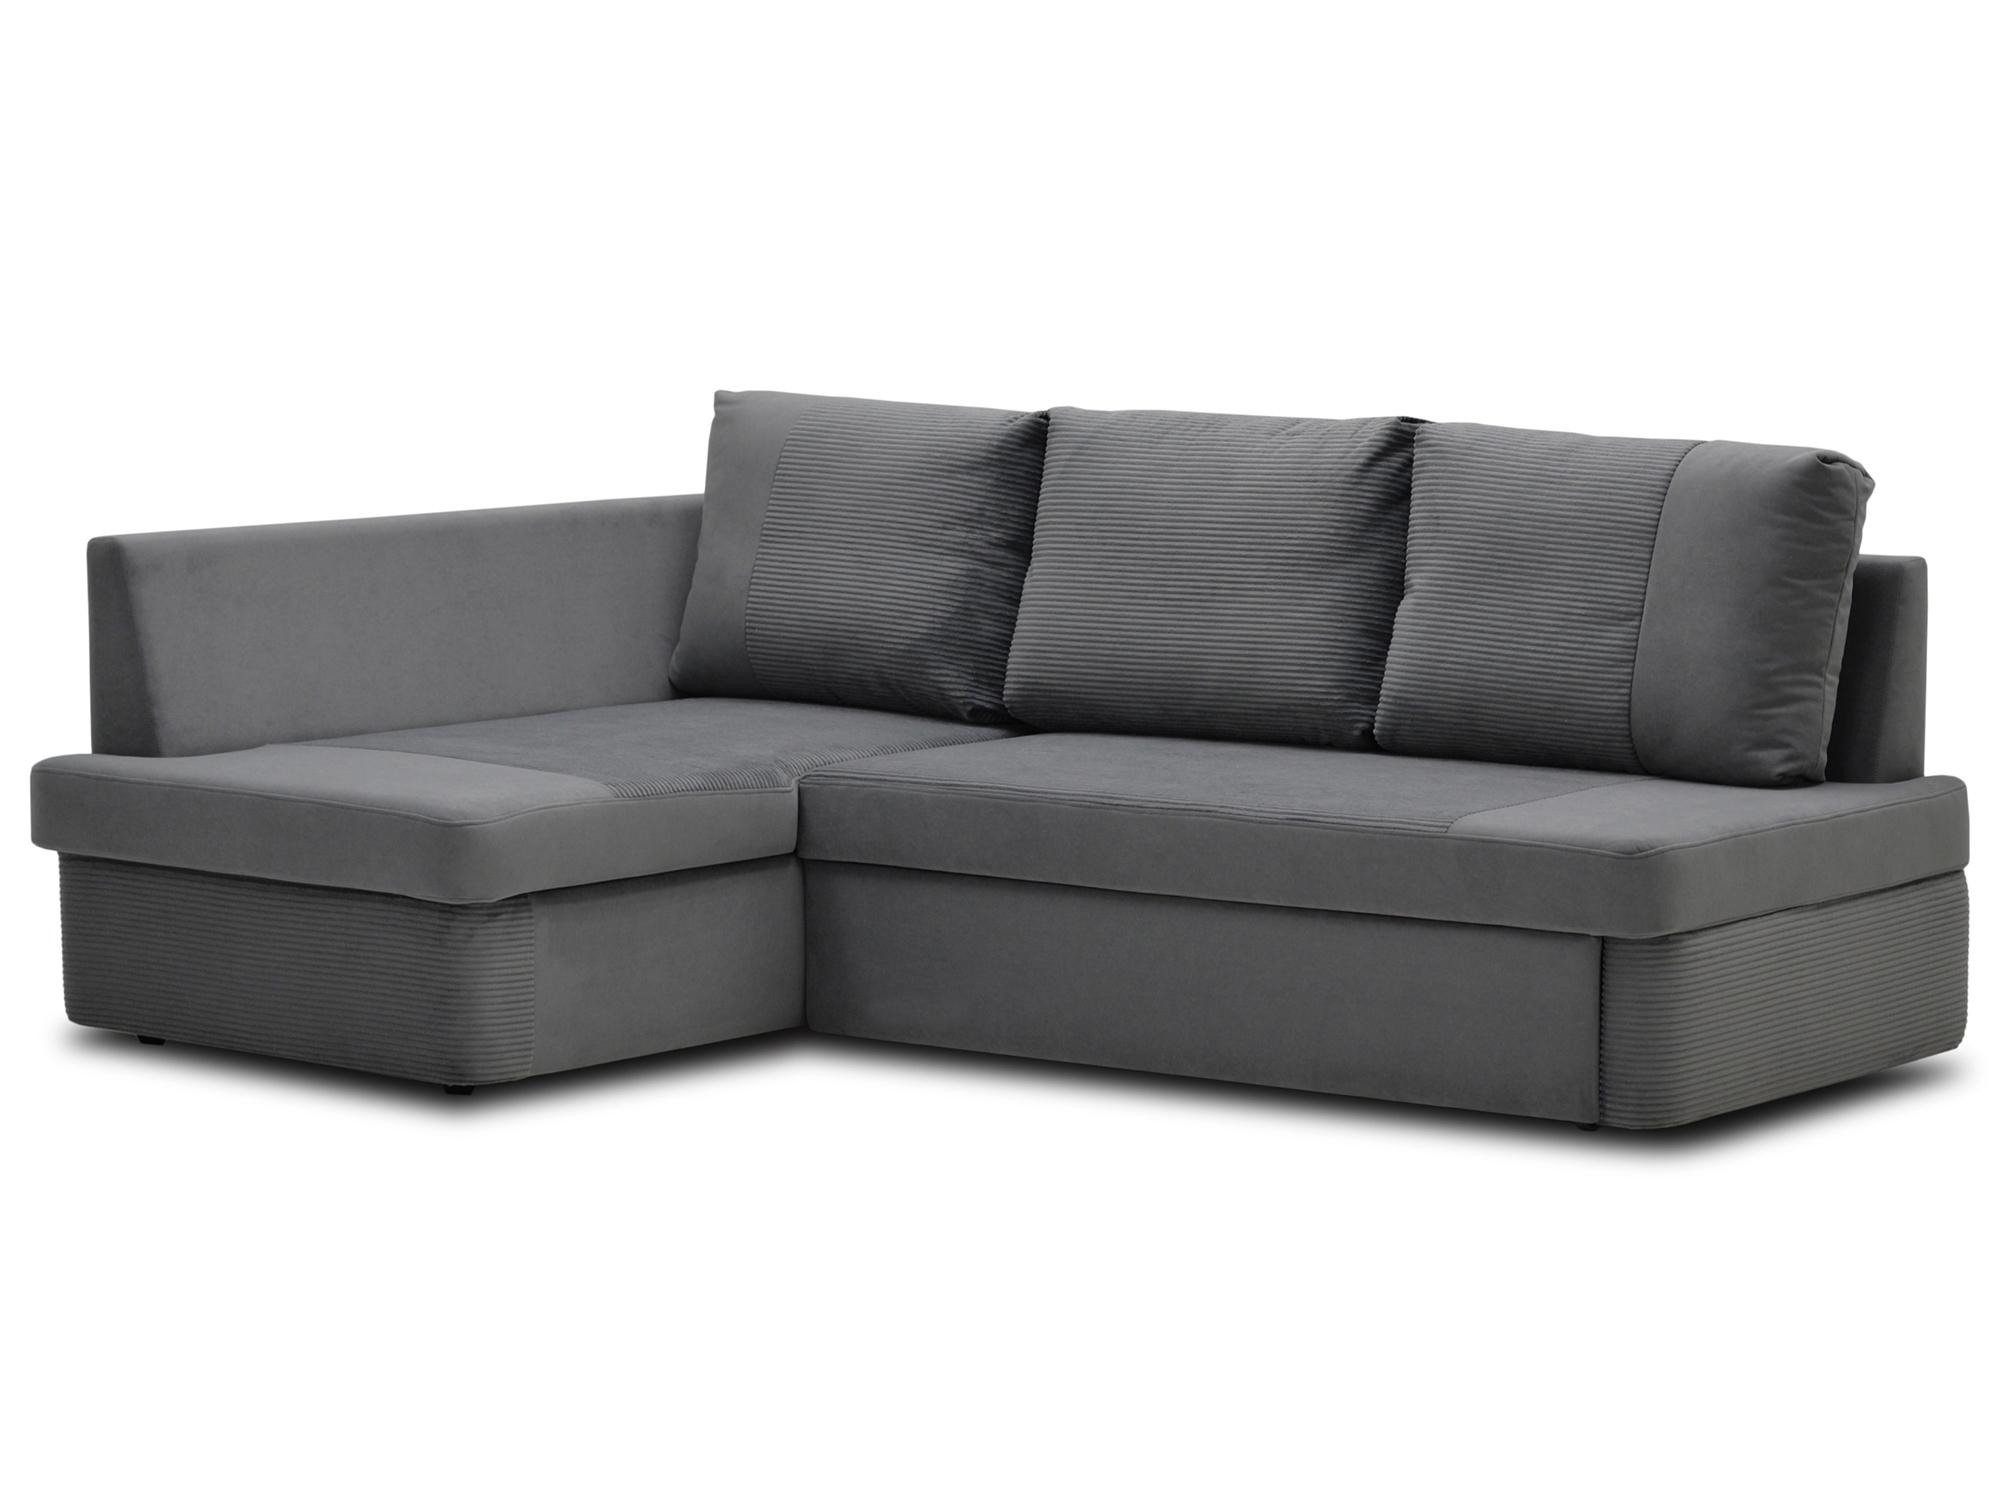 Угловой диван Спаро левый MebelVia Серый